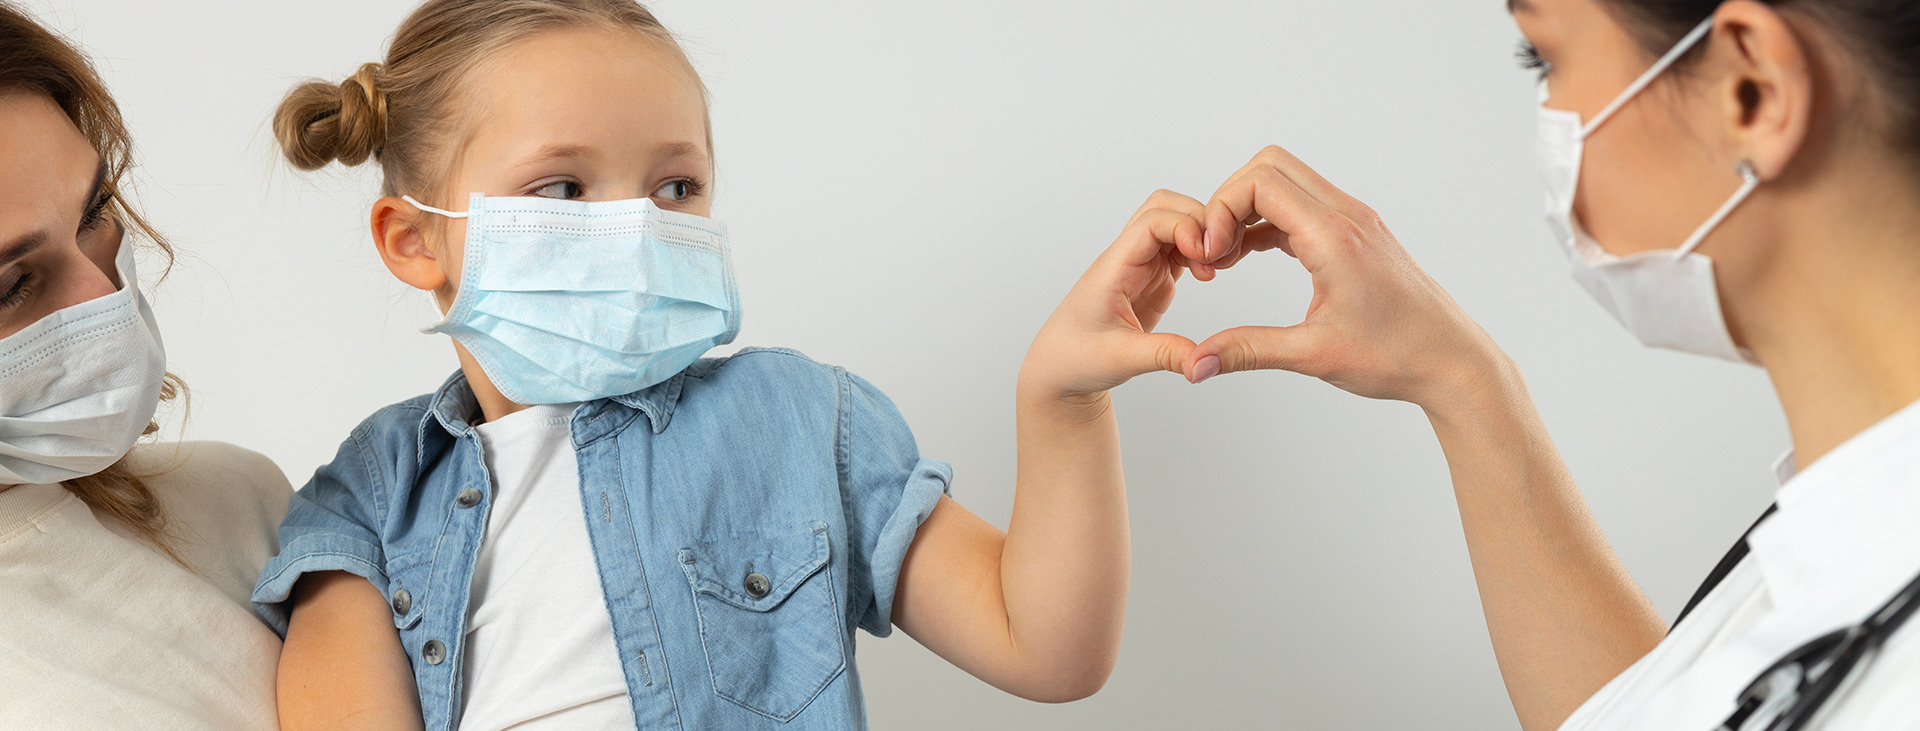 $775,000 To improve health care outcomes